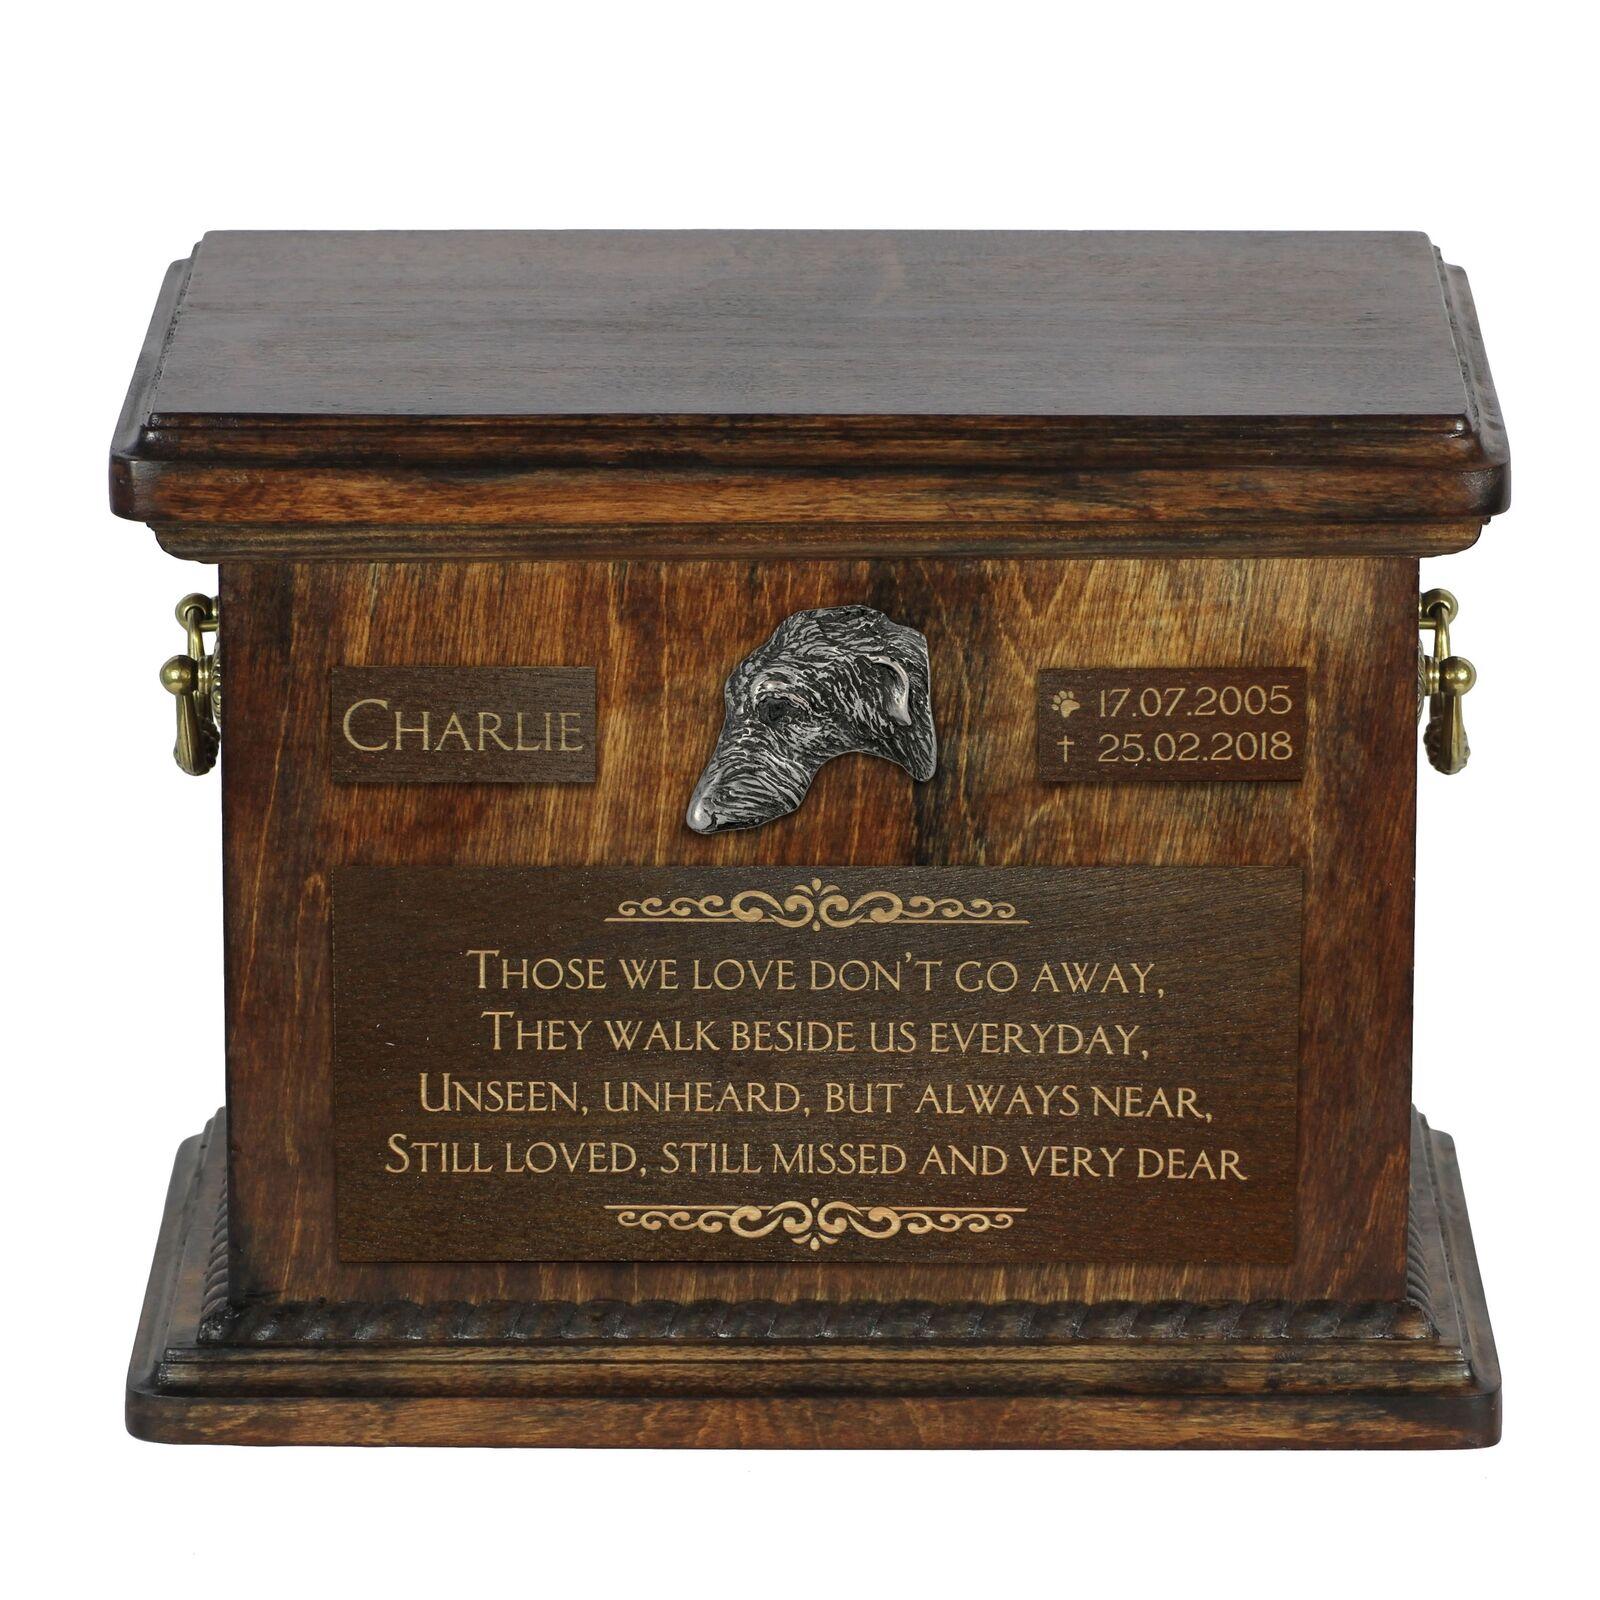 Scottish deerhound  Urn for dog's ashes with image of a dog, Art Dog